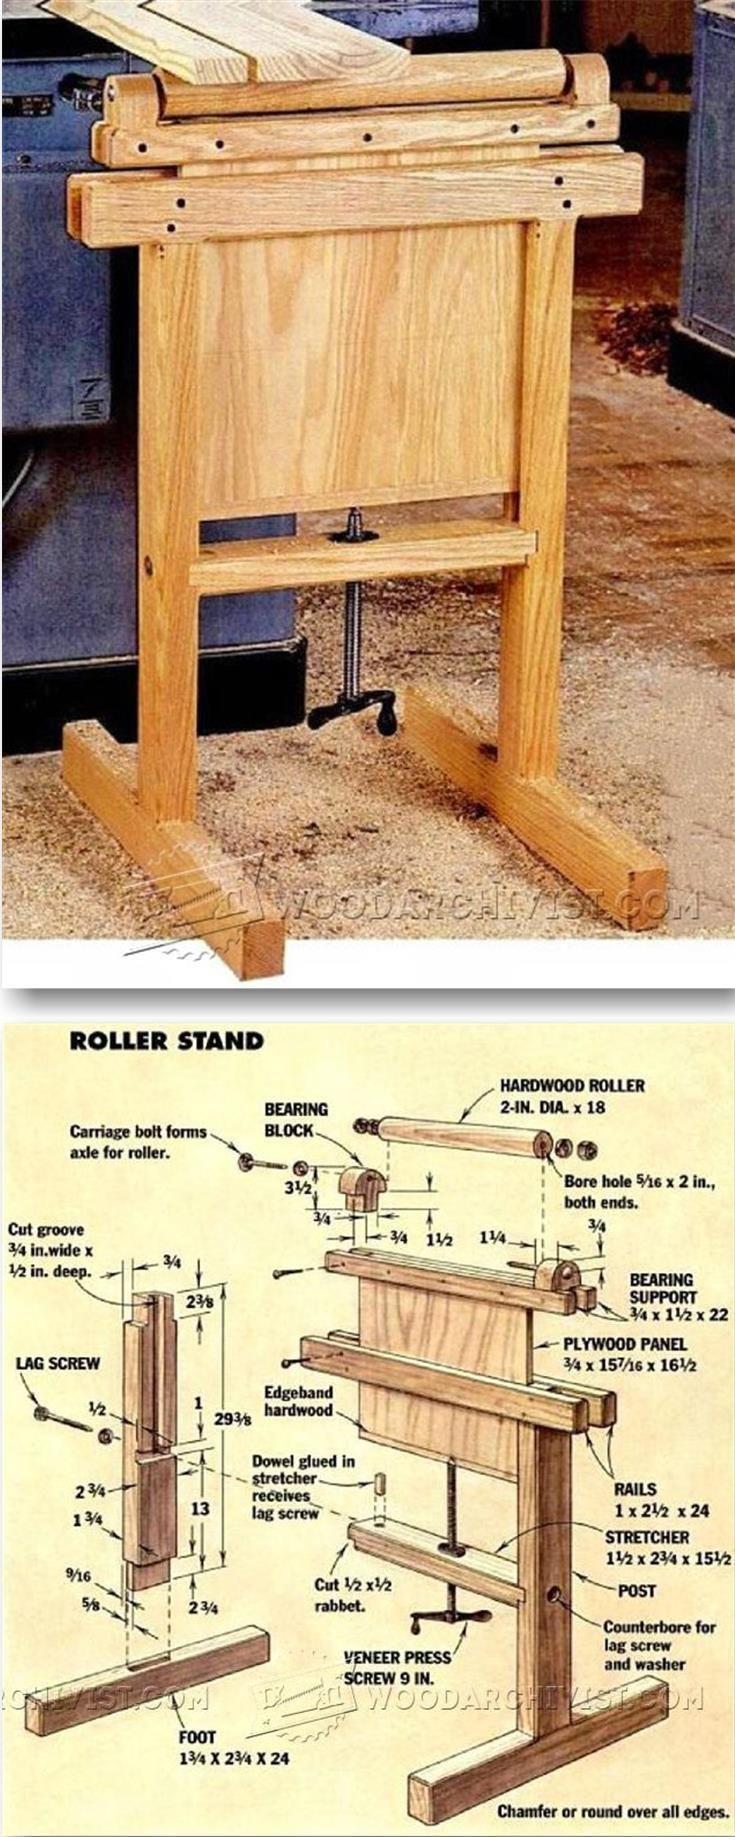 Roller Stand Plans - Workshop Solutions Plans, Tips and Tricks | WoodArchivist.com